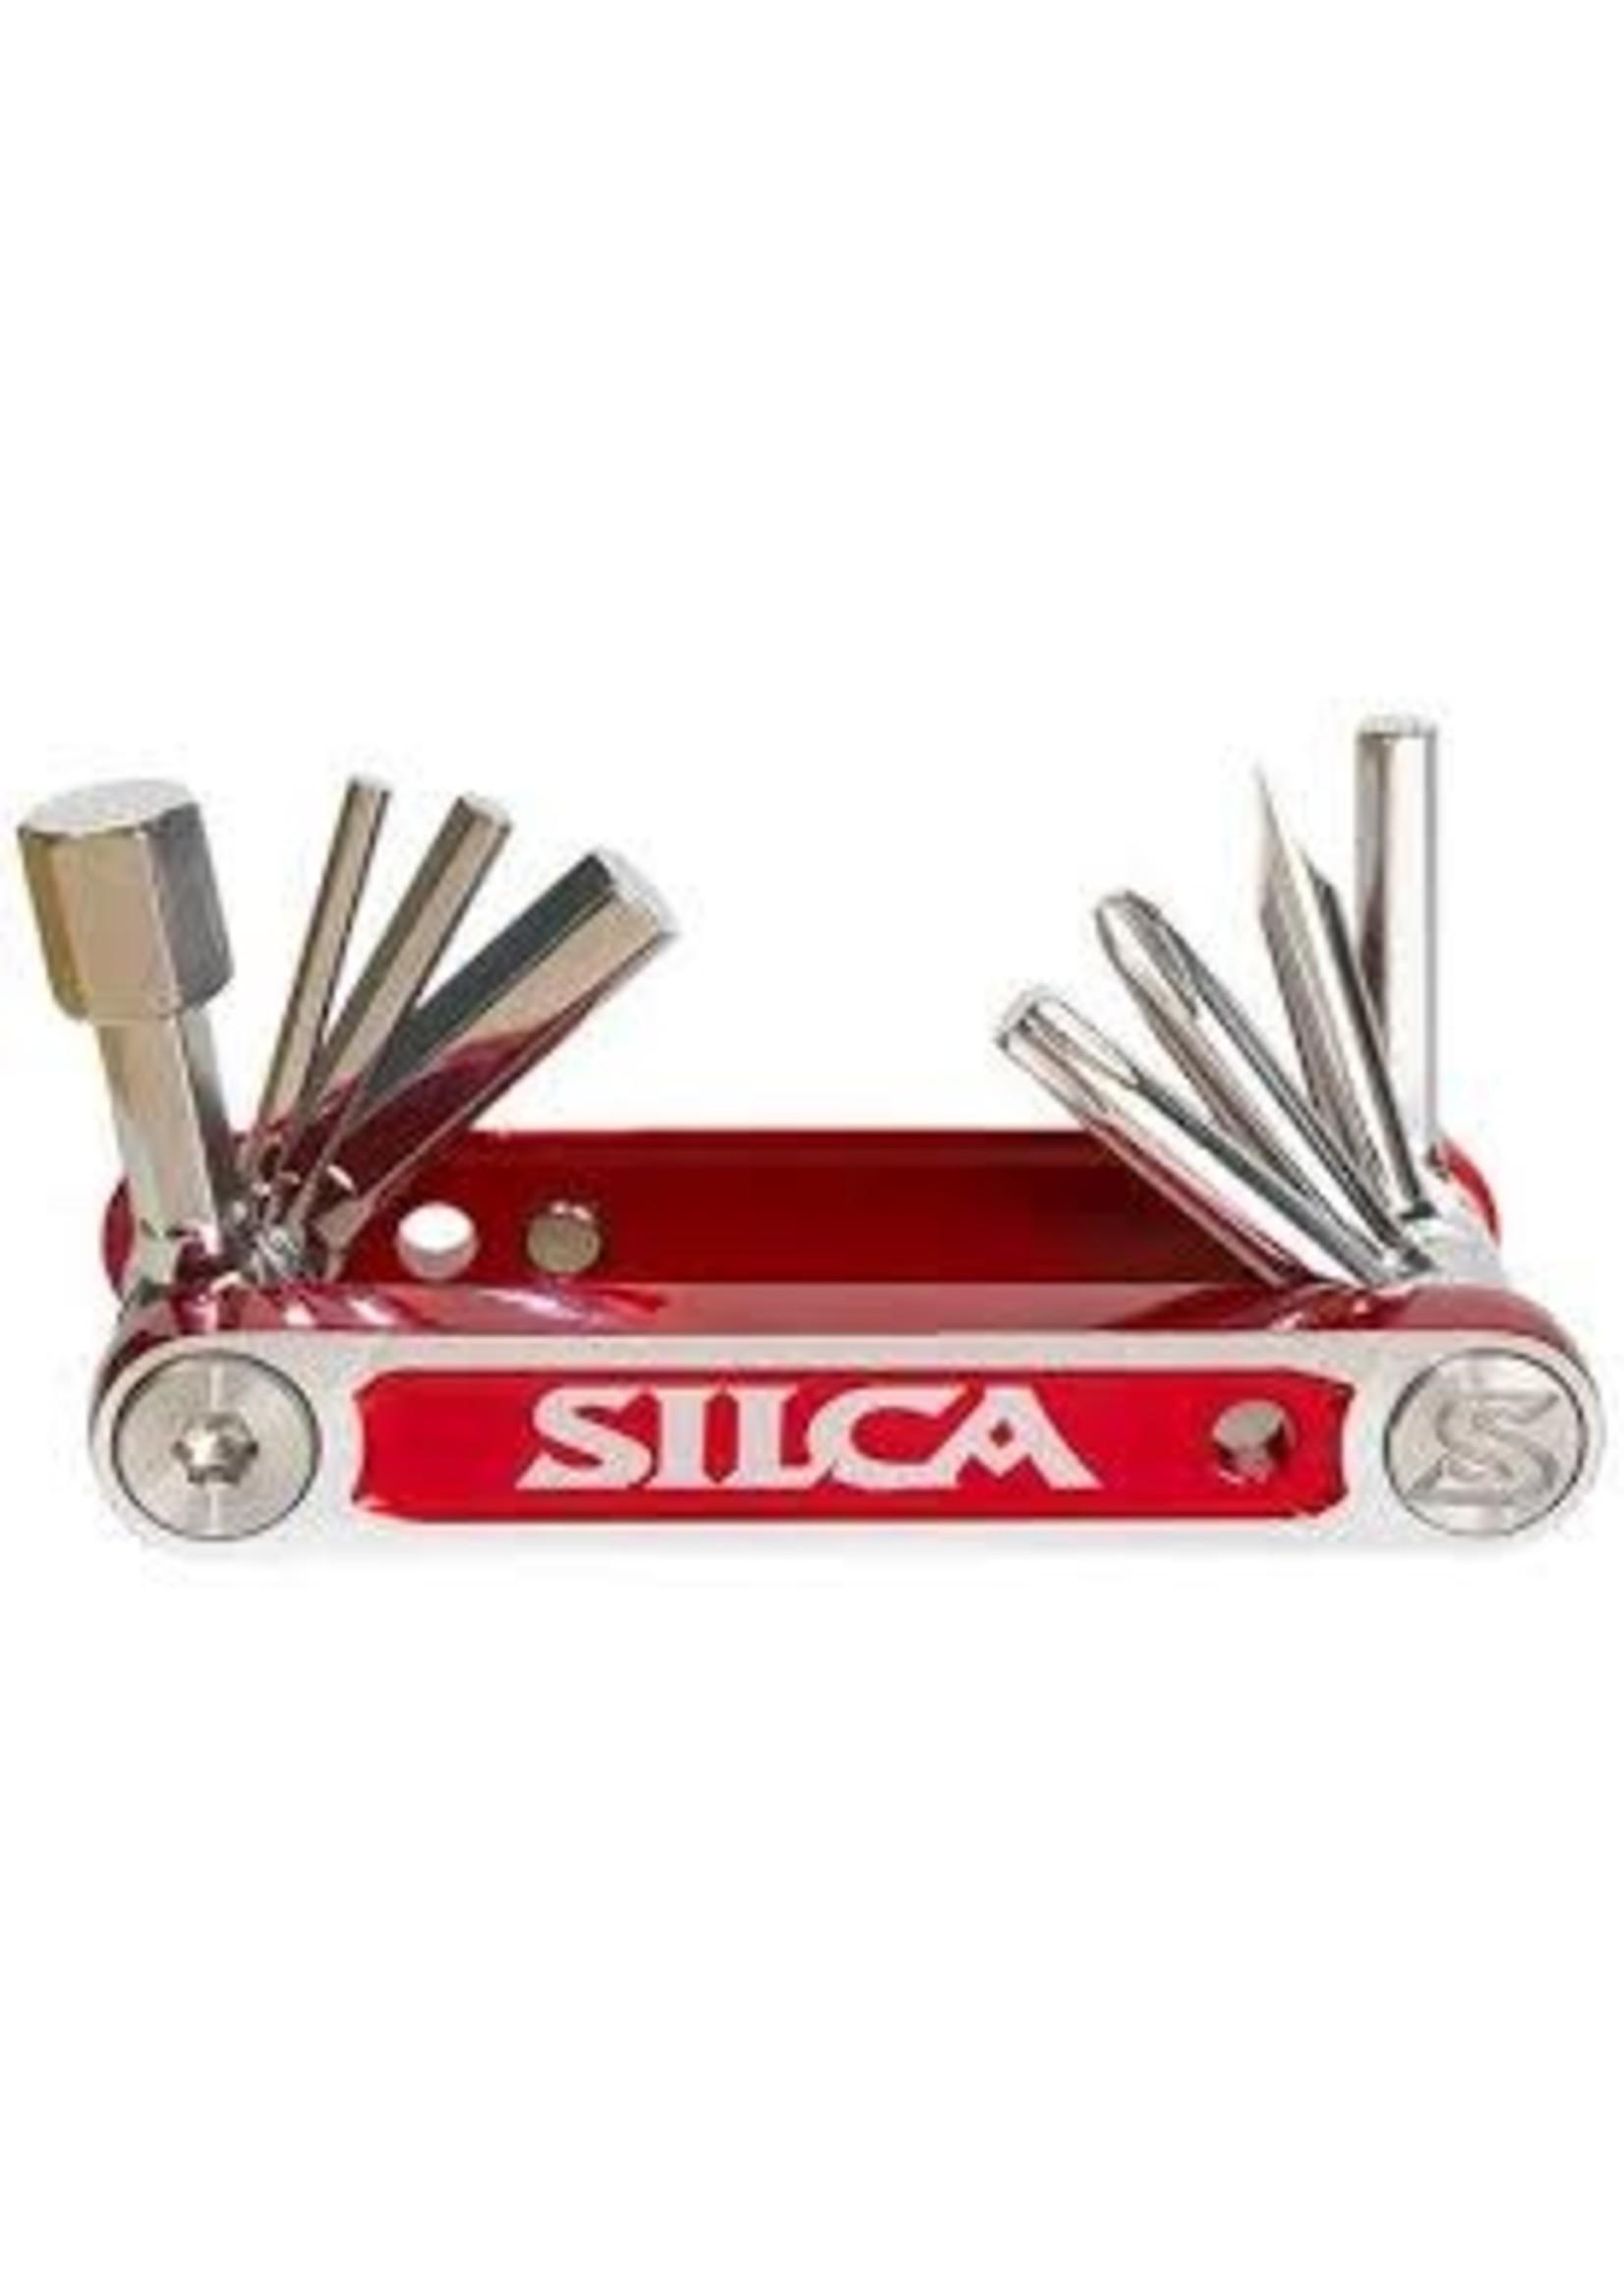 silca SILCA ITALIAN ARMY KNIFE - NOVE